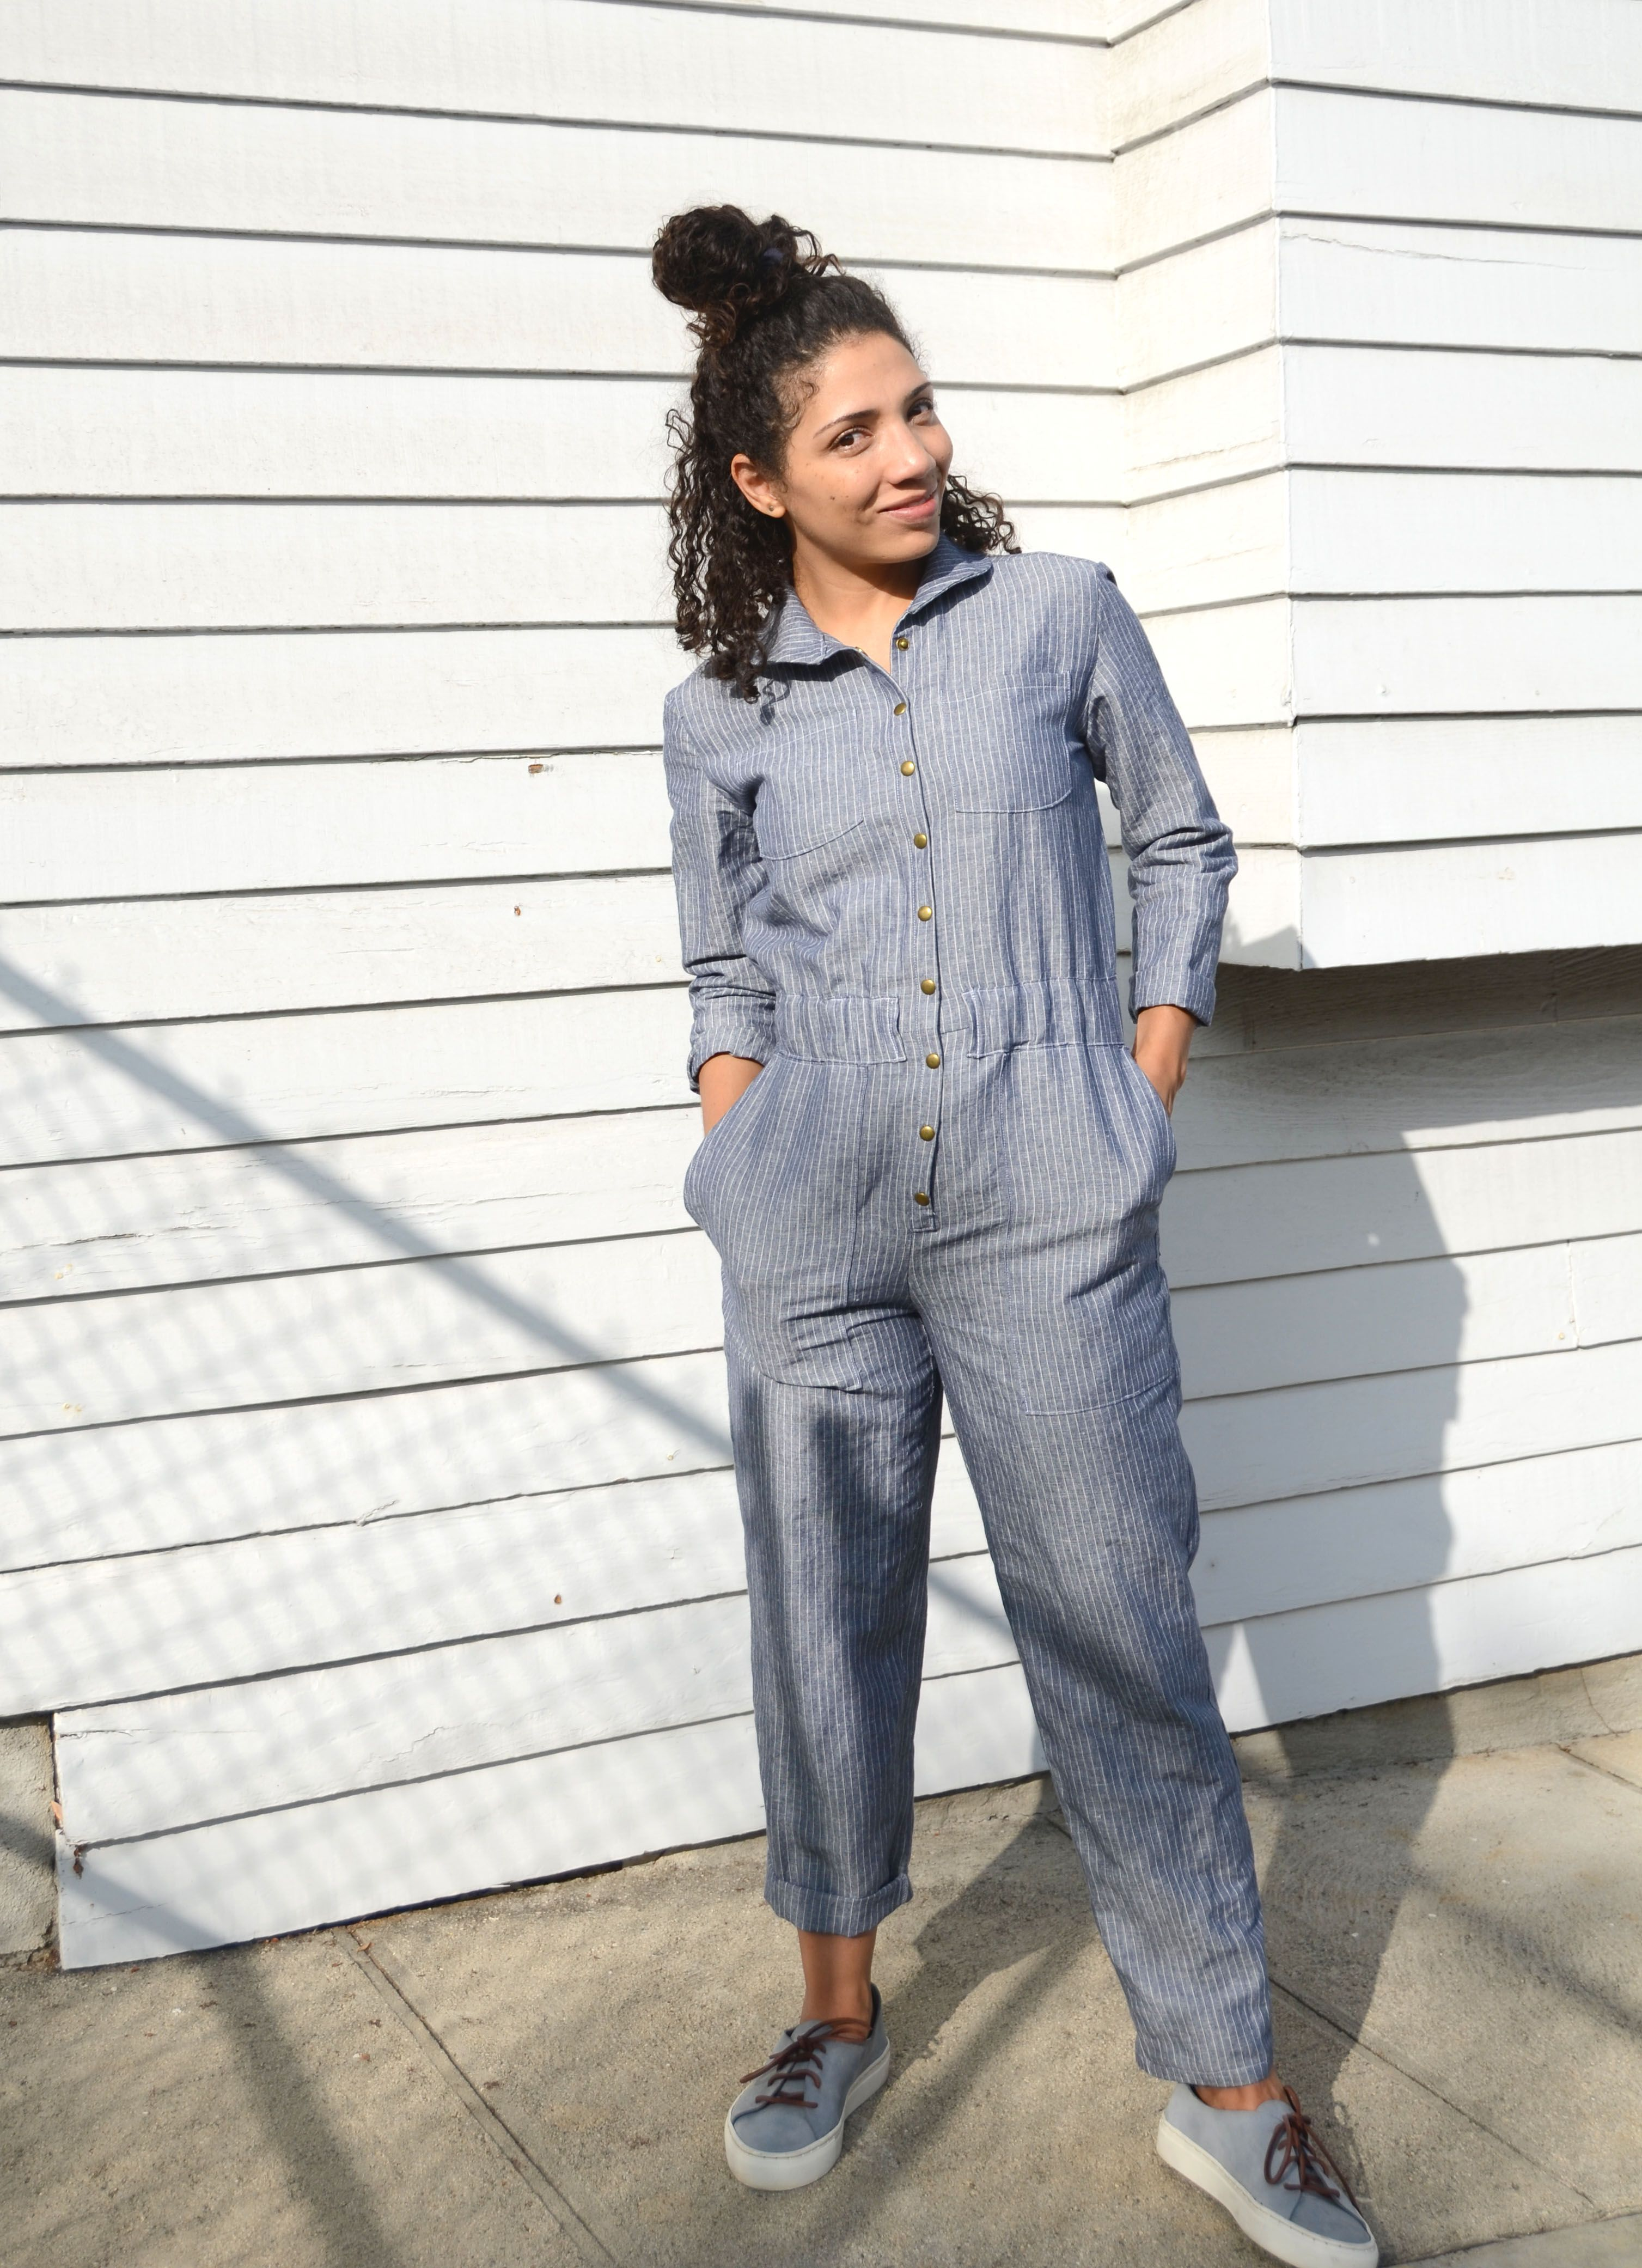 Boiler Suit Sewing Pattern : boiler, sewing, pattern, Boiler, Pattern, Testing, Jasika, Nicole, Pattern,, Suit,, Sewing, Patterns